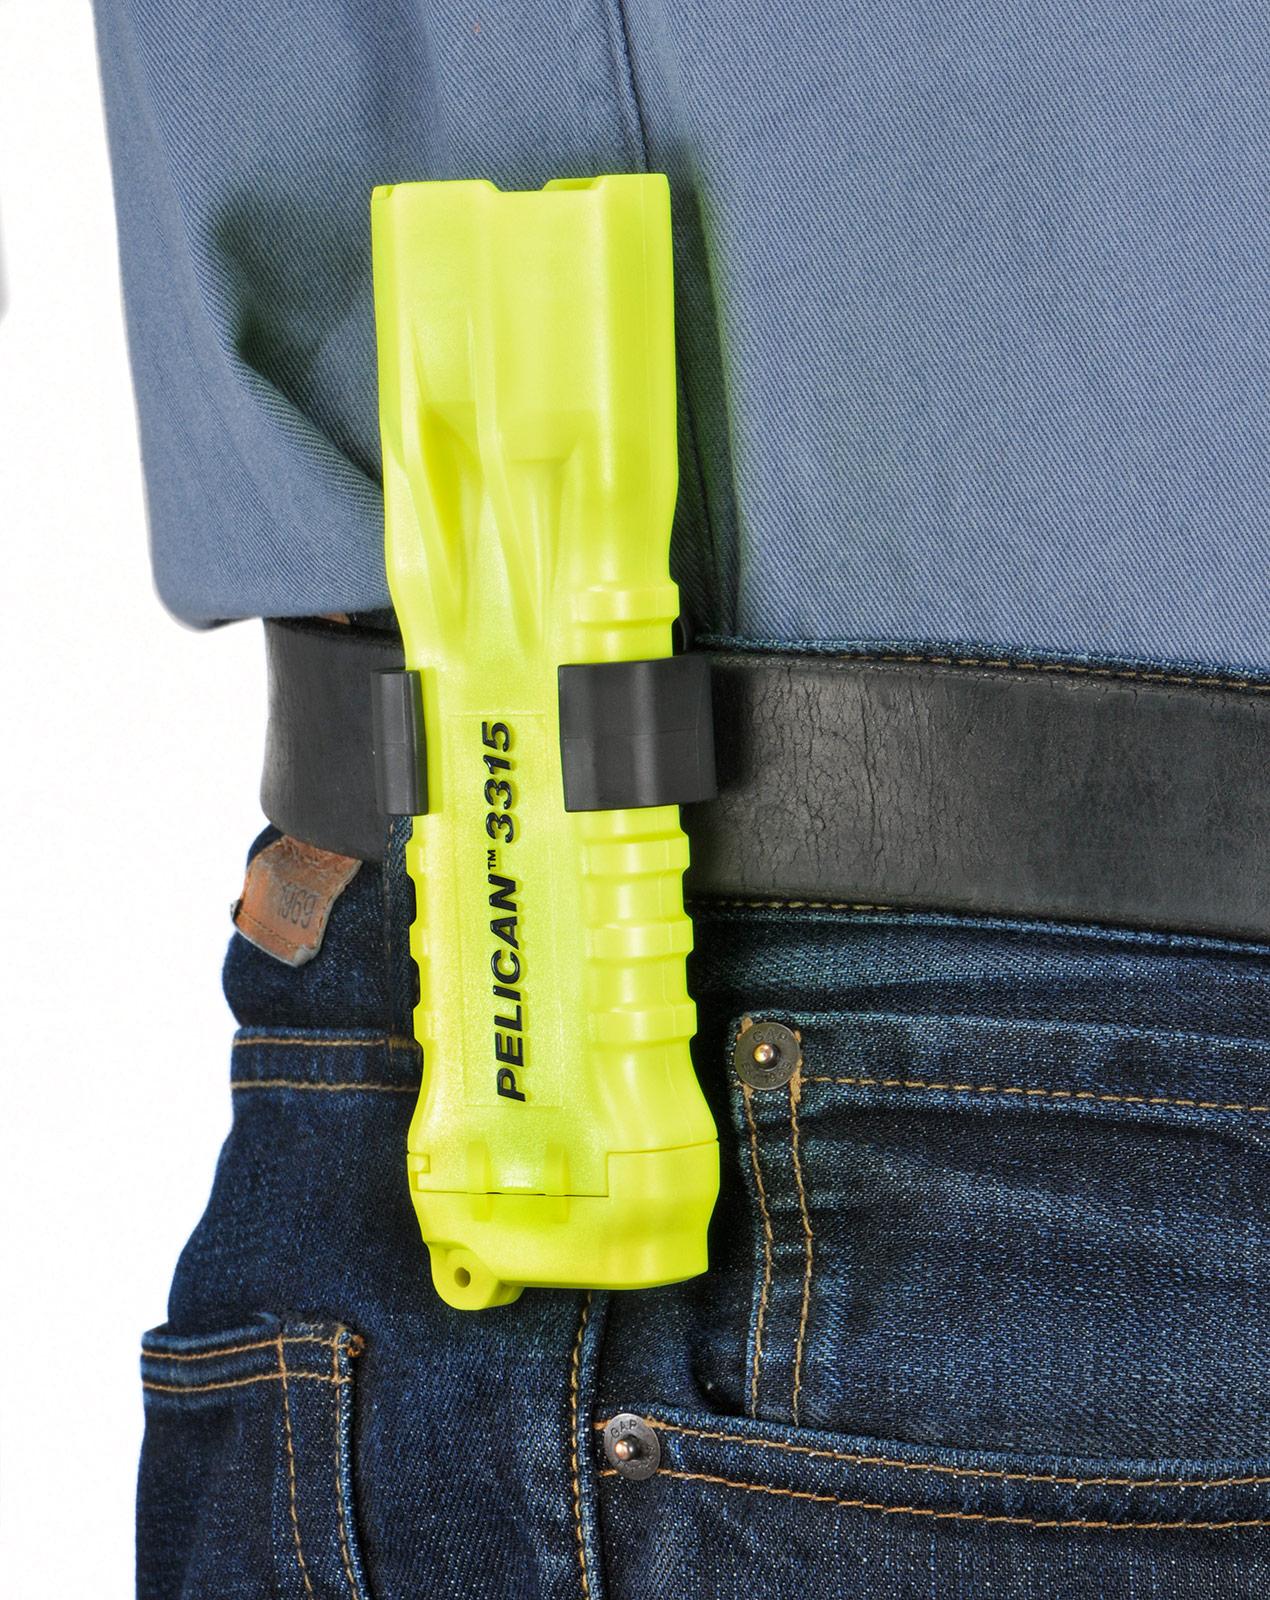 pelican 3315 belt clip yellow flashlight